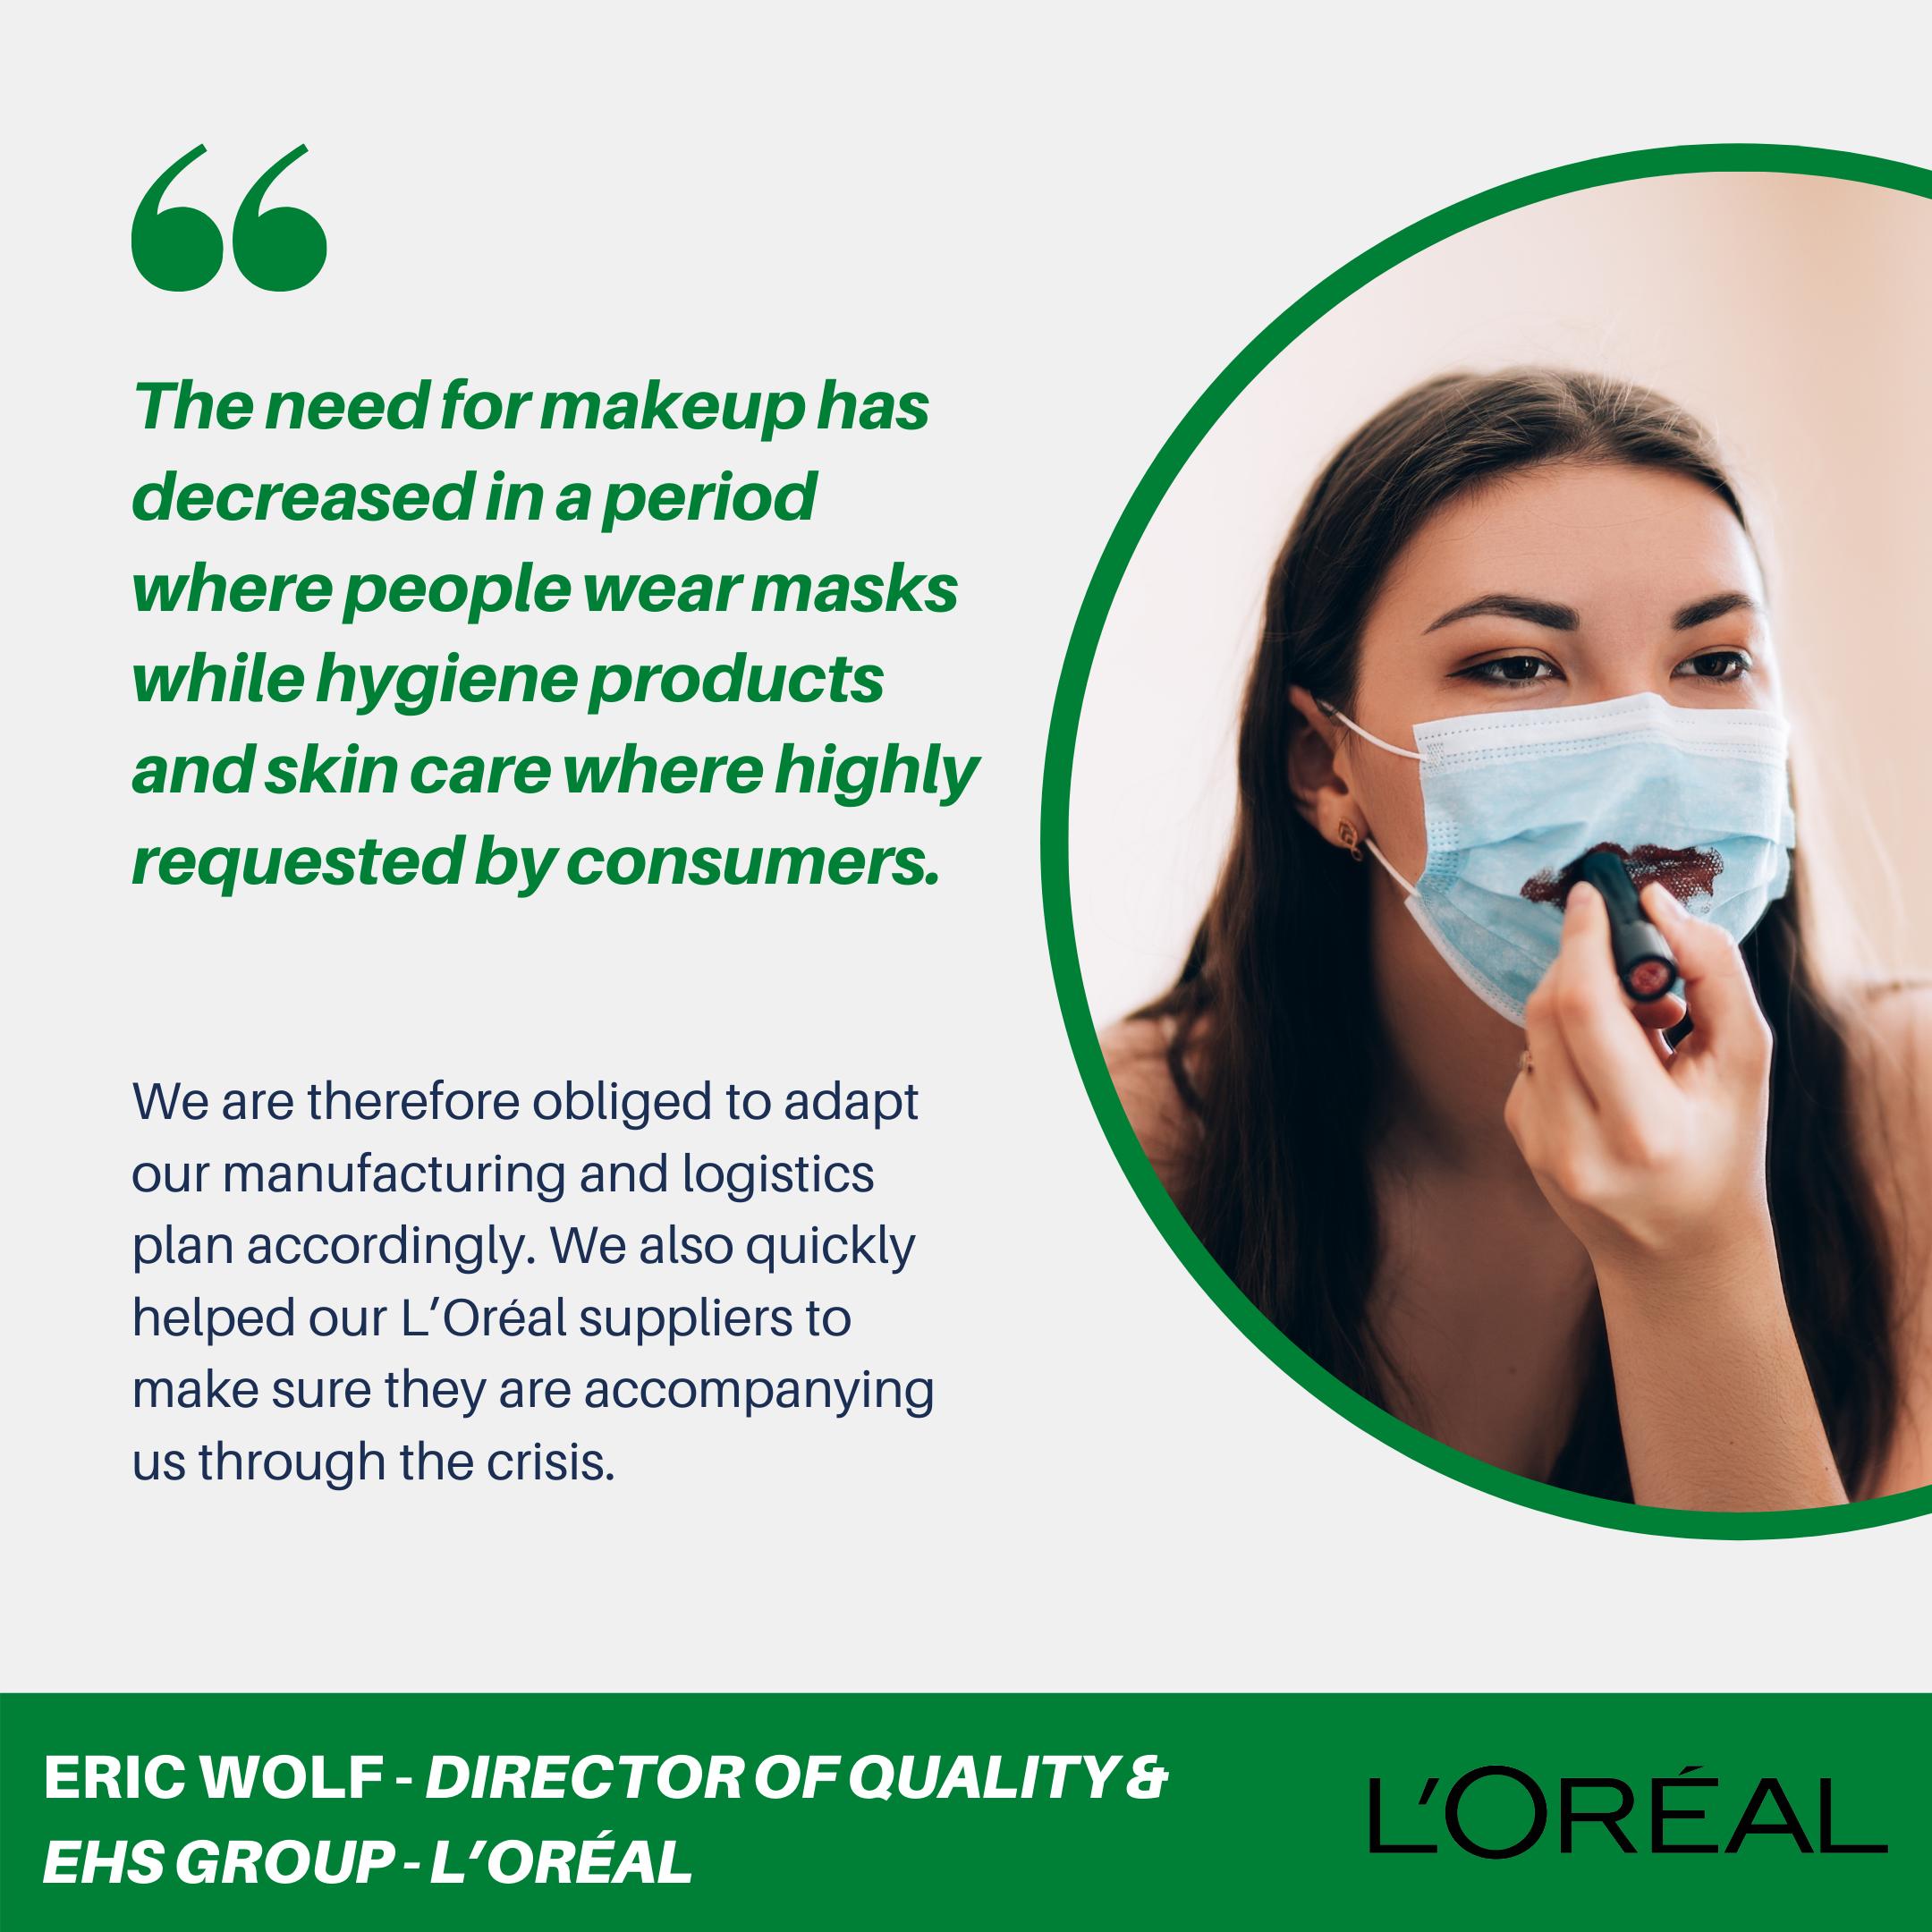 L'Oréal - Eric Wolf Quote